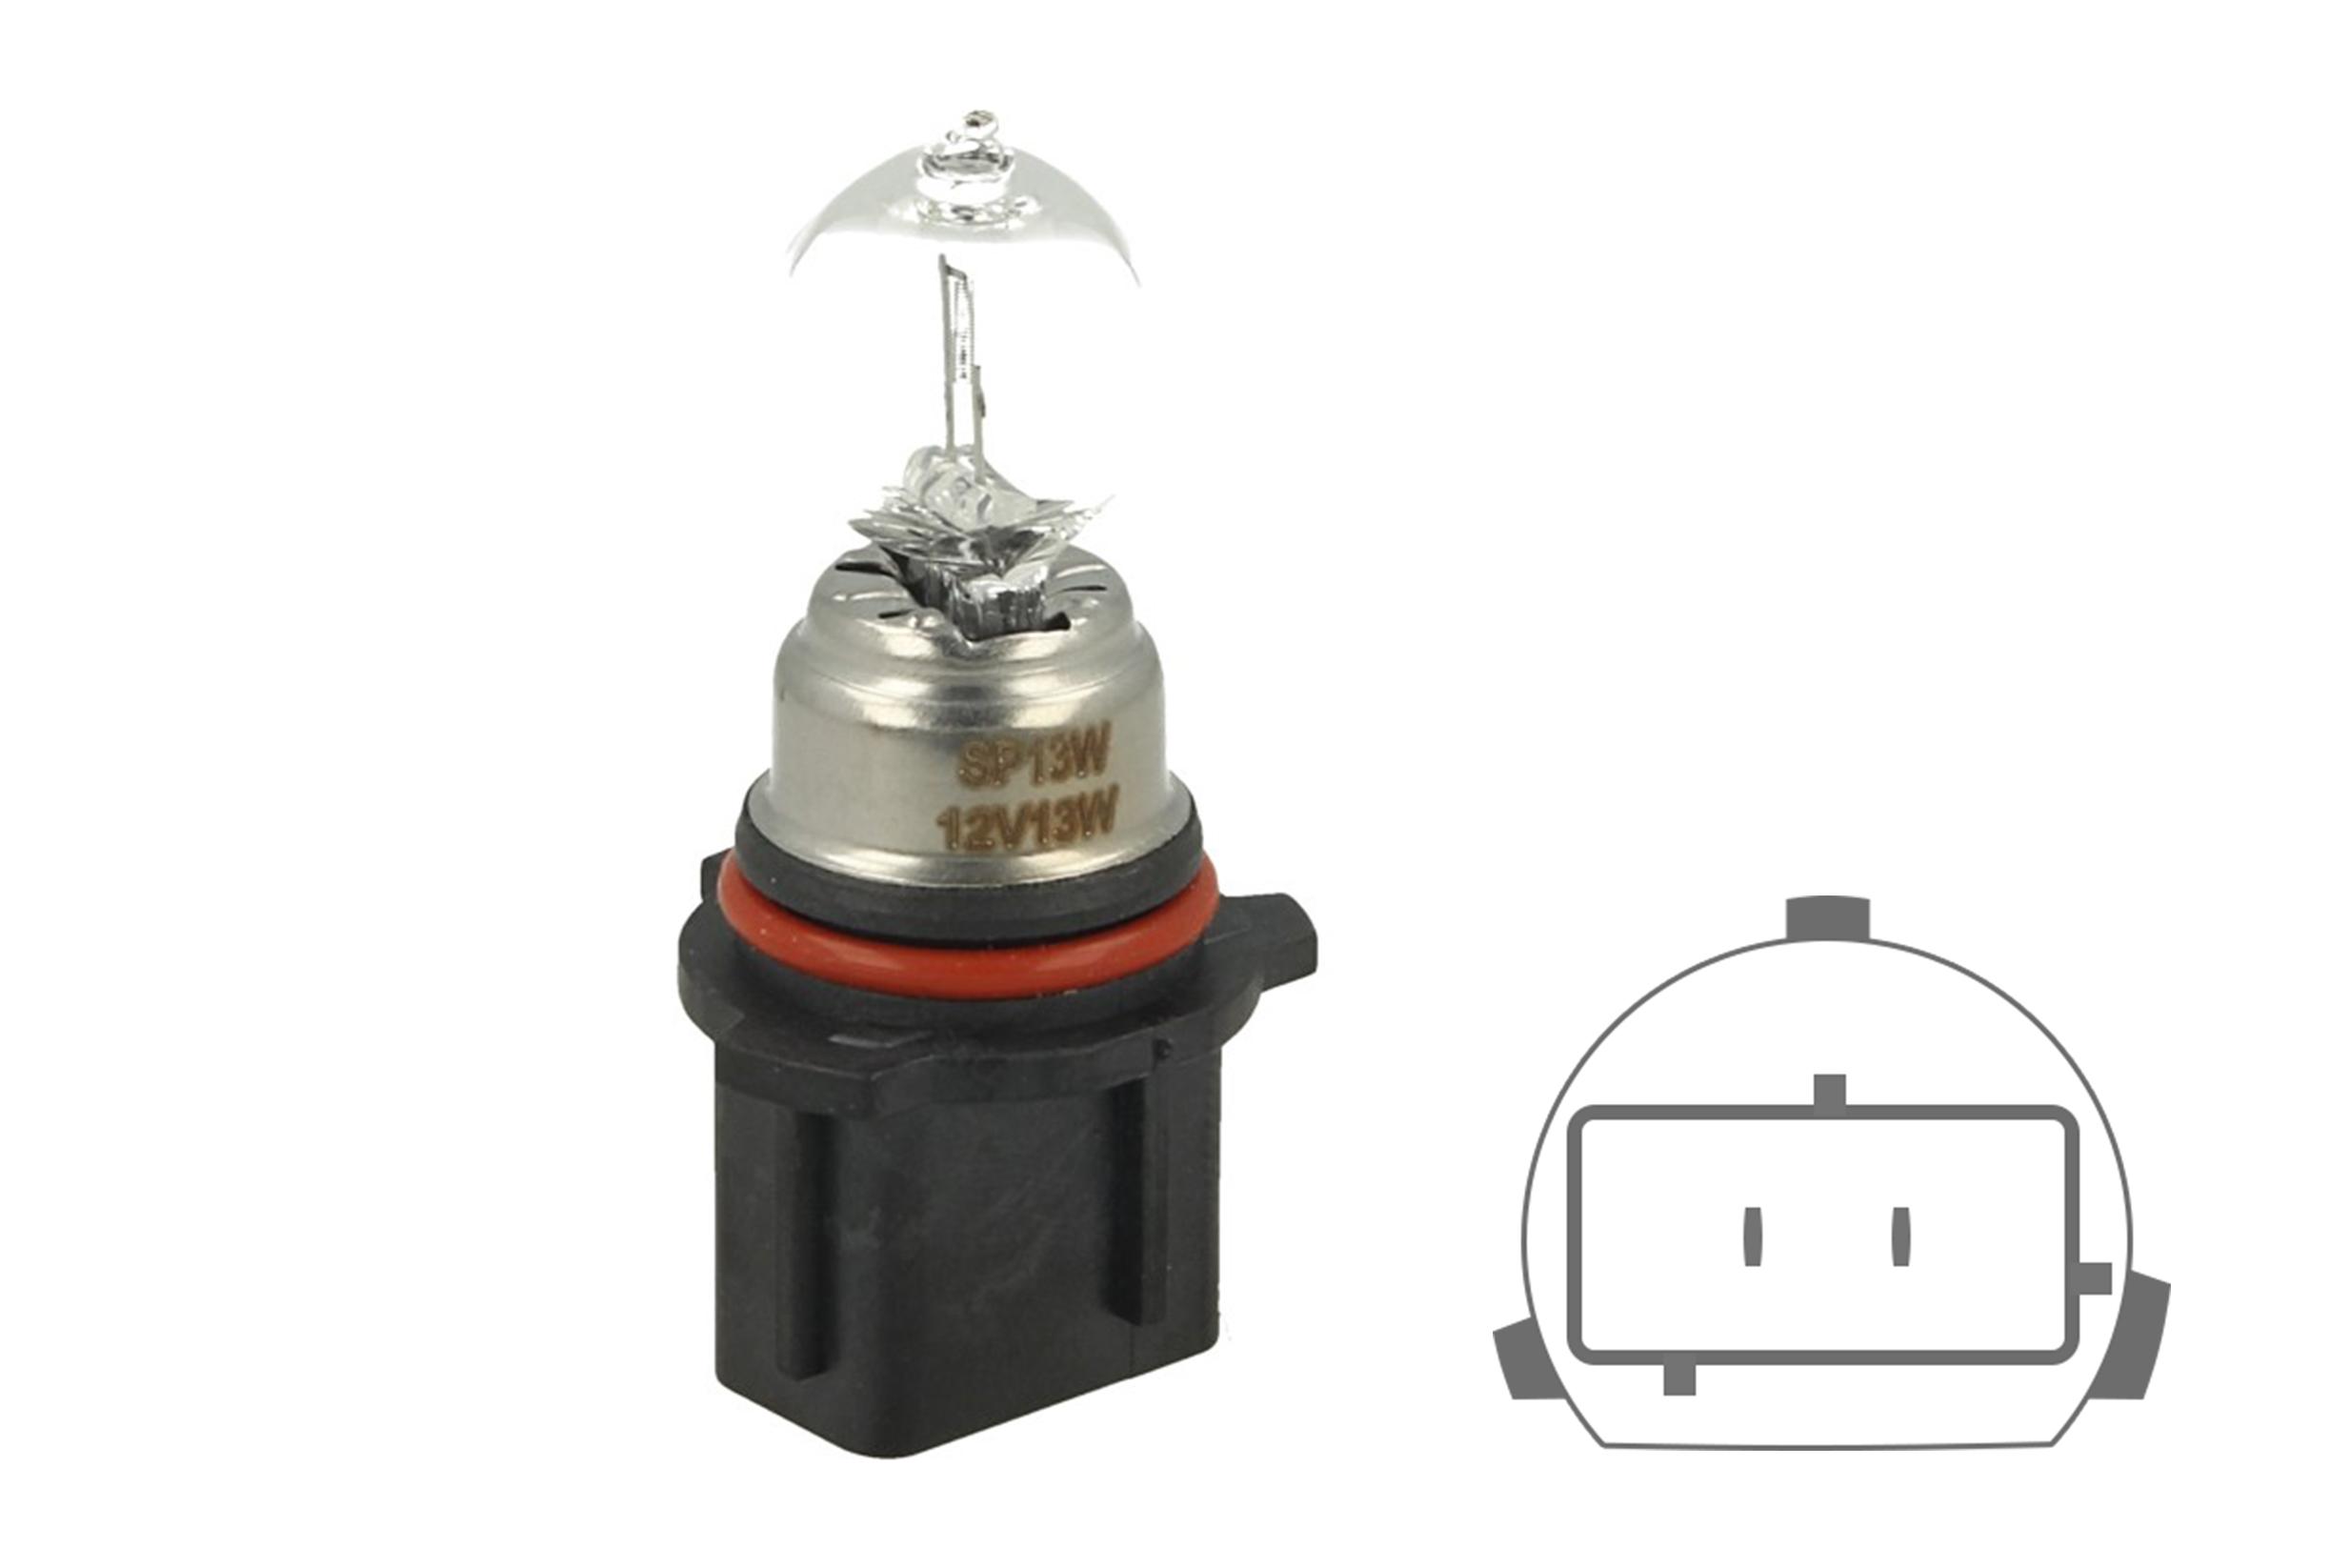 Lampada Alogena P13W 12V 13W PG18.5d-1 Clear Compatibile Philips 12277C1 - PZ